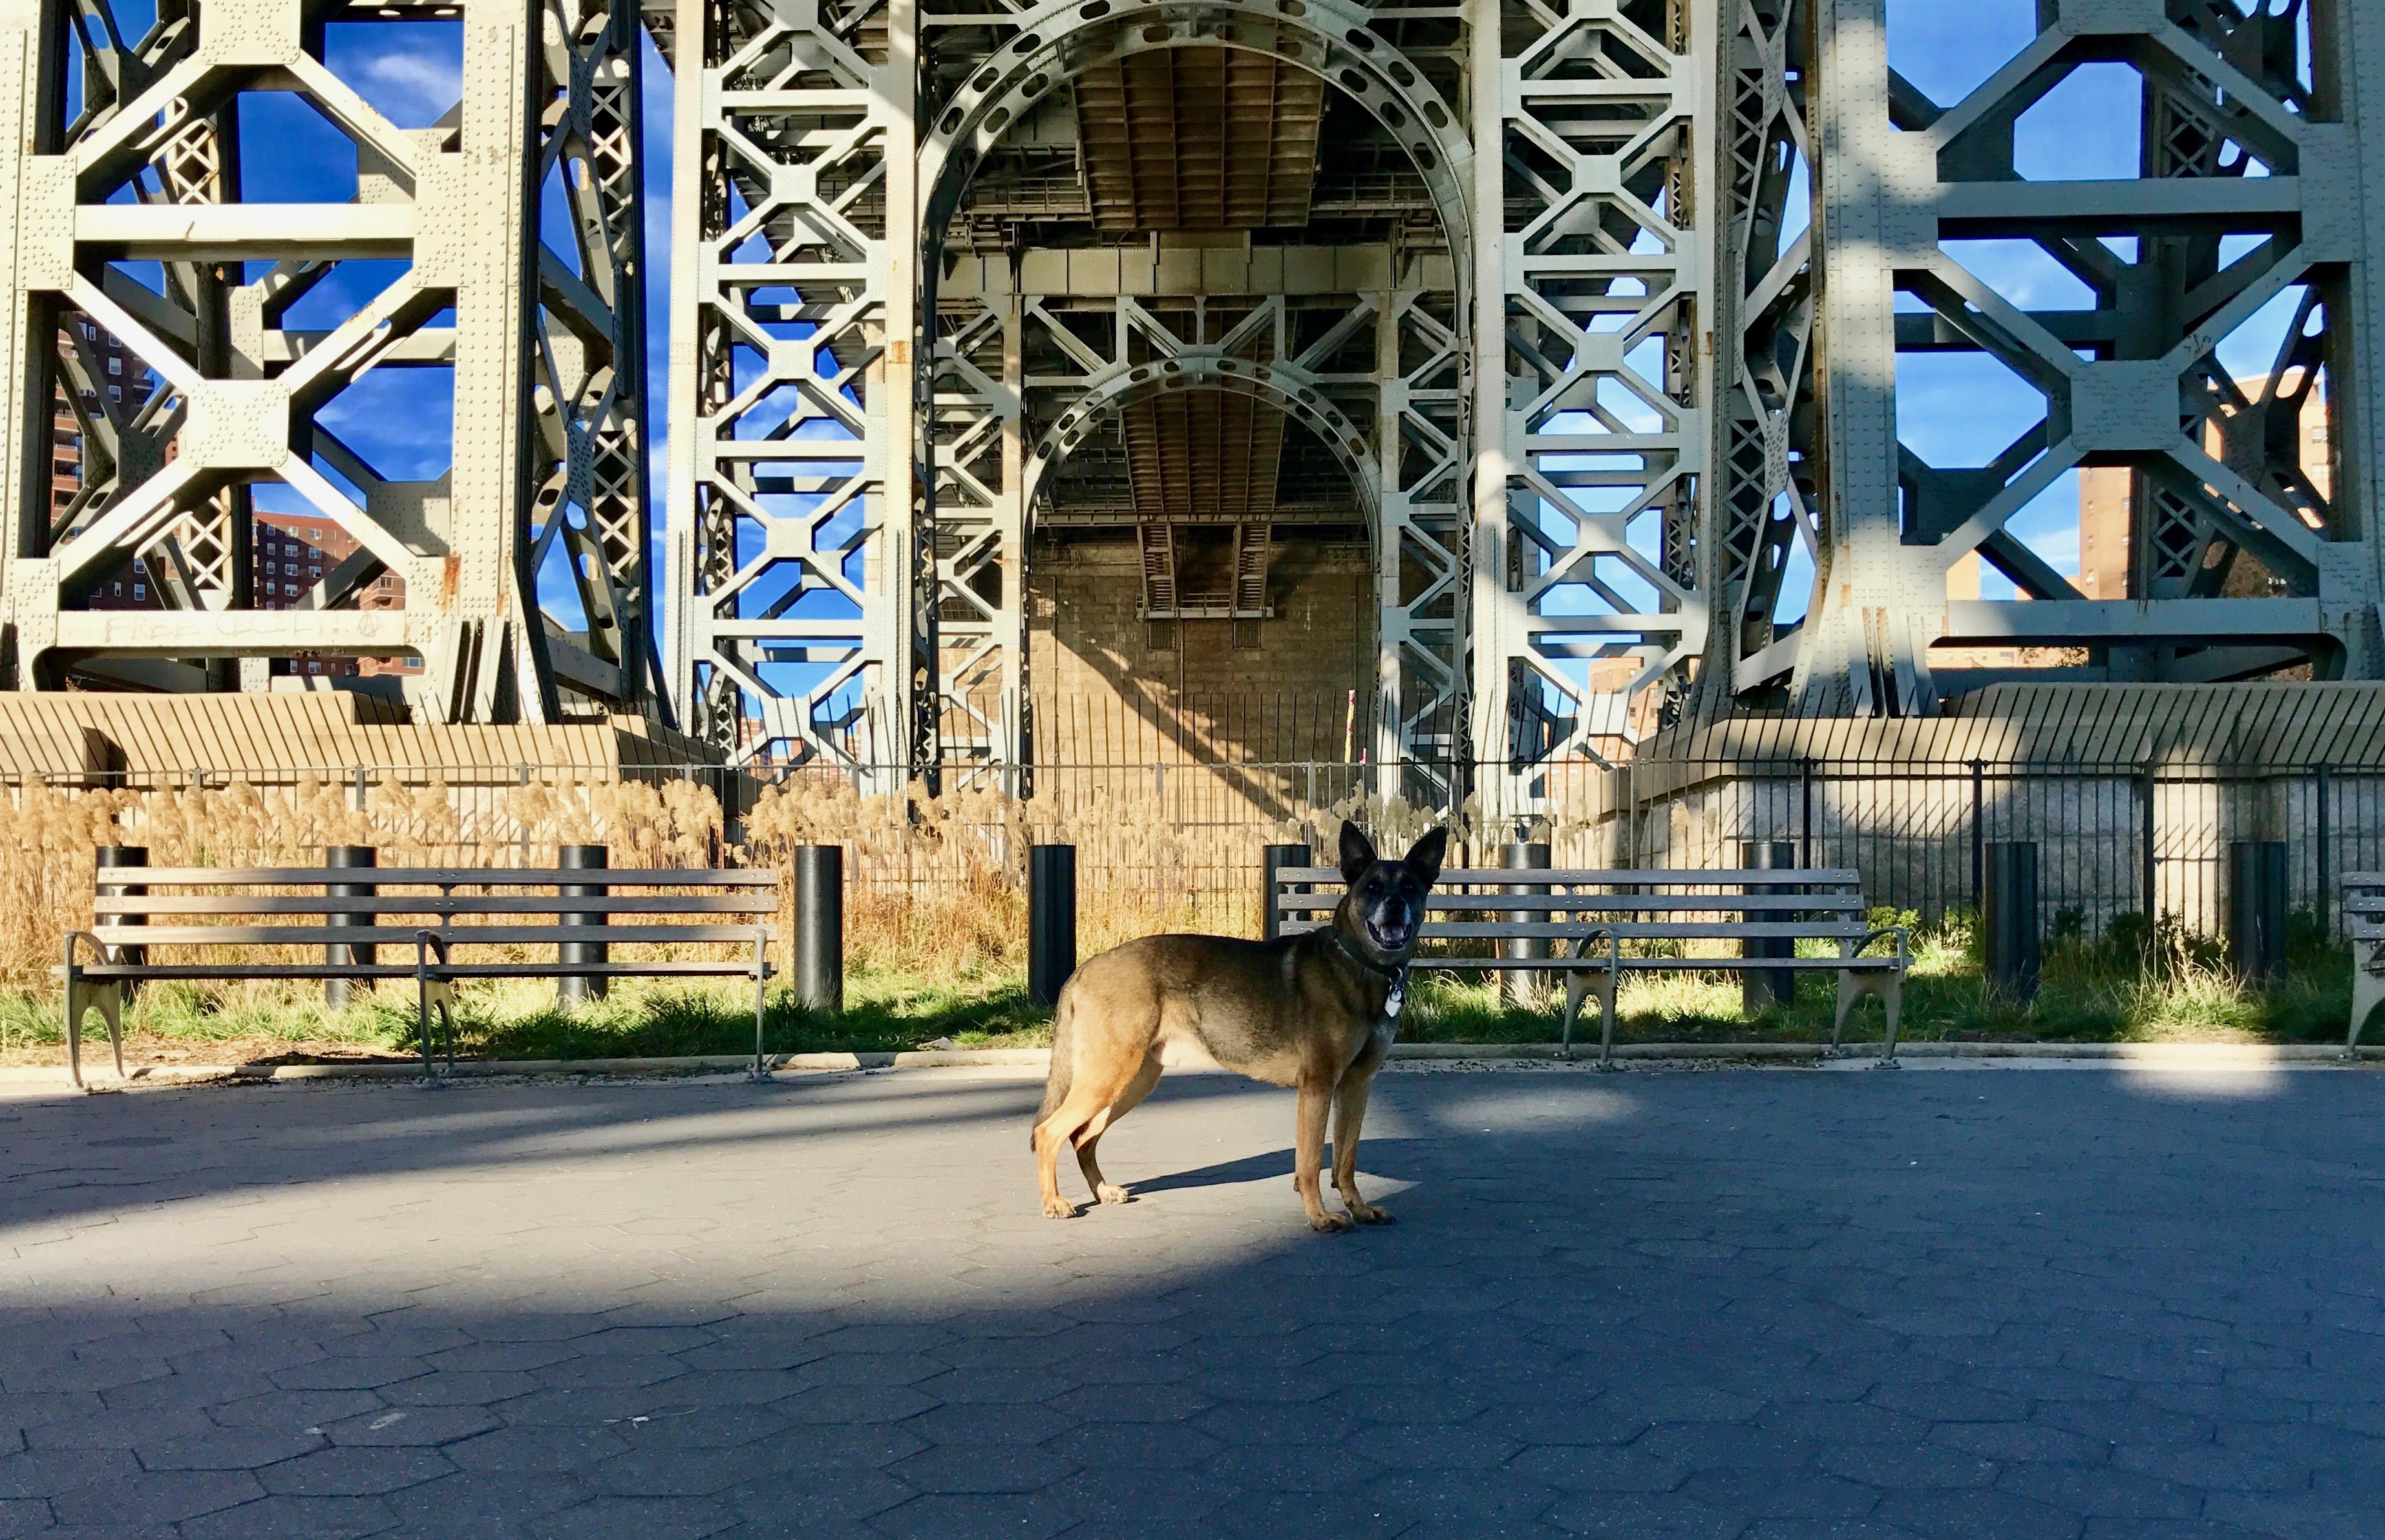 Sharav, Natan Gesher's Belgian Malinois, in front of the Williamsburg Bridge in Manhattan.